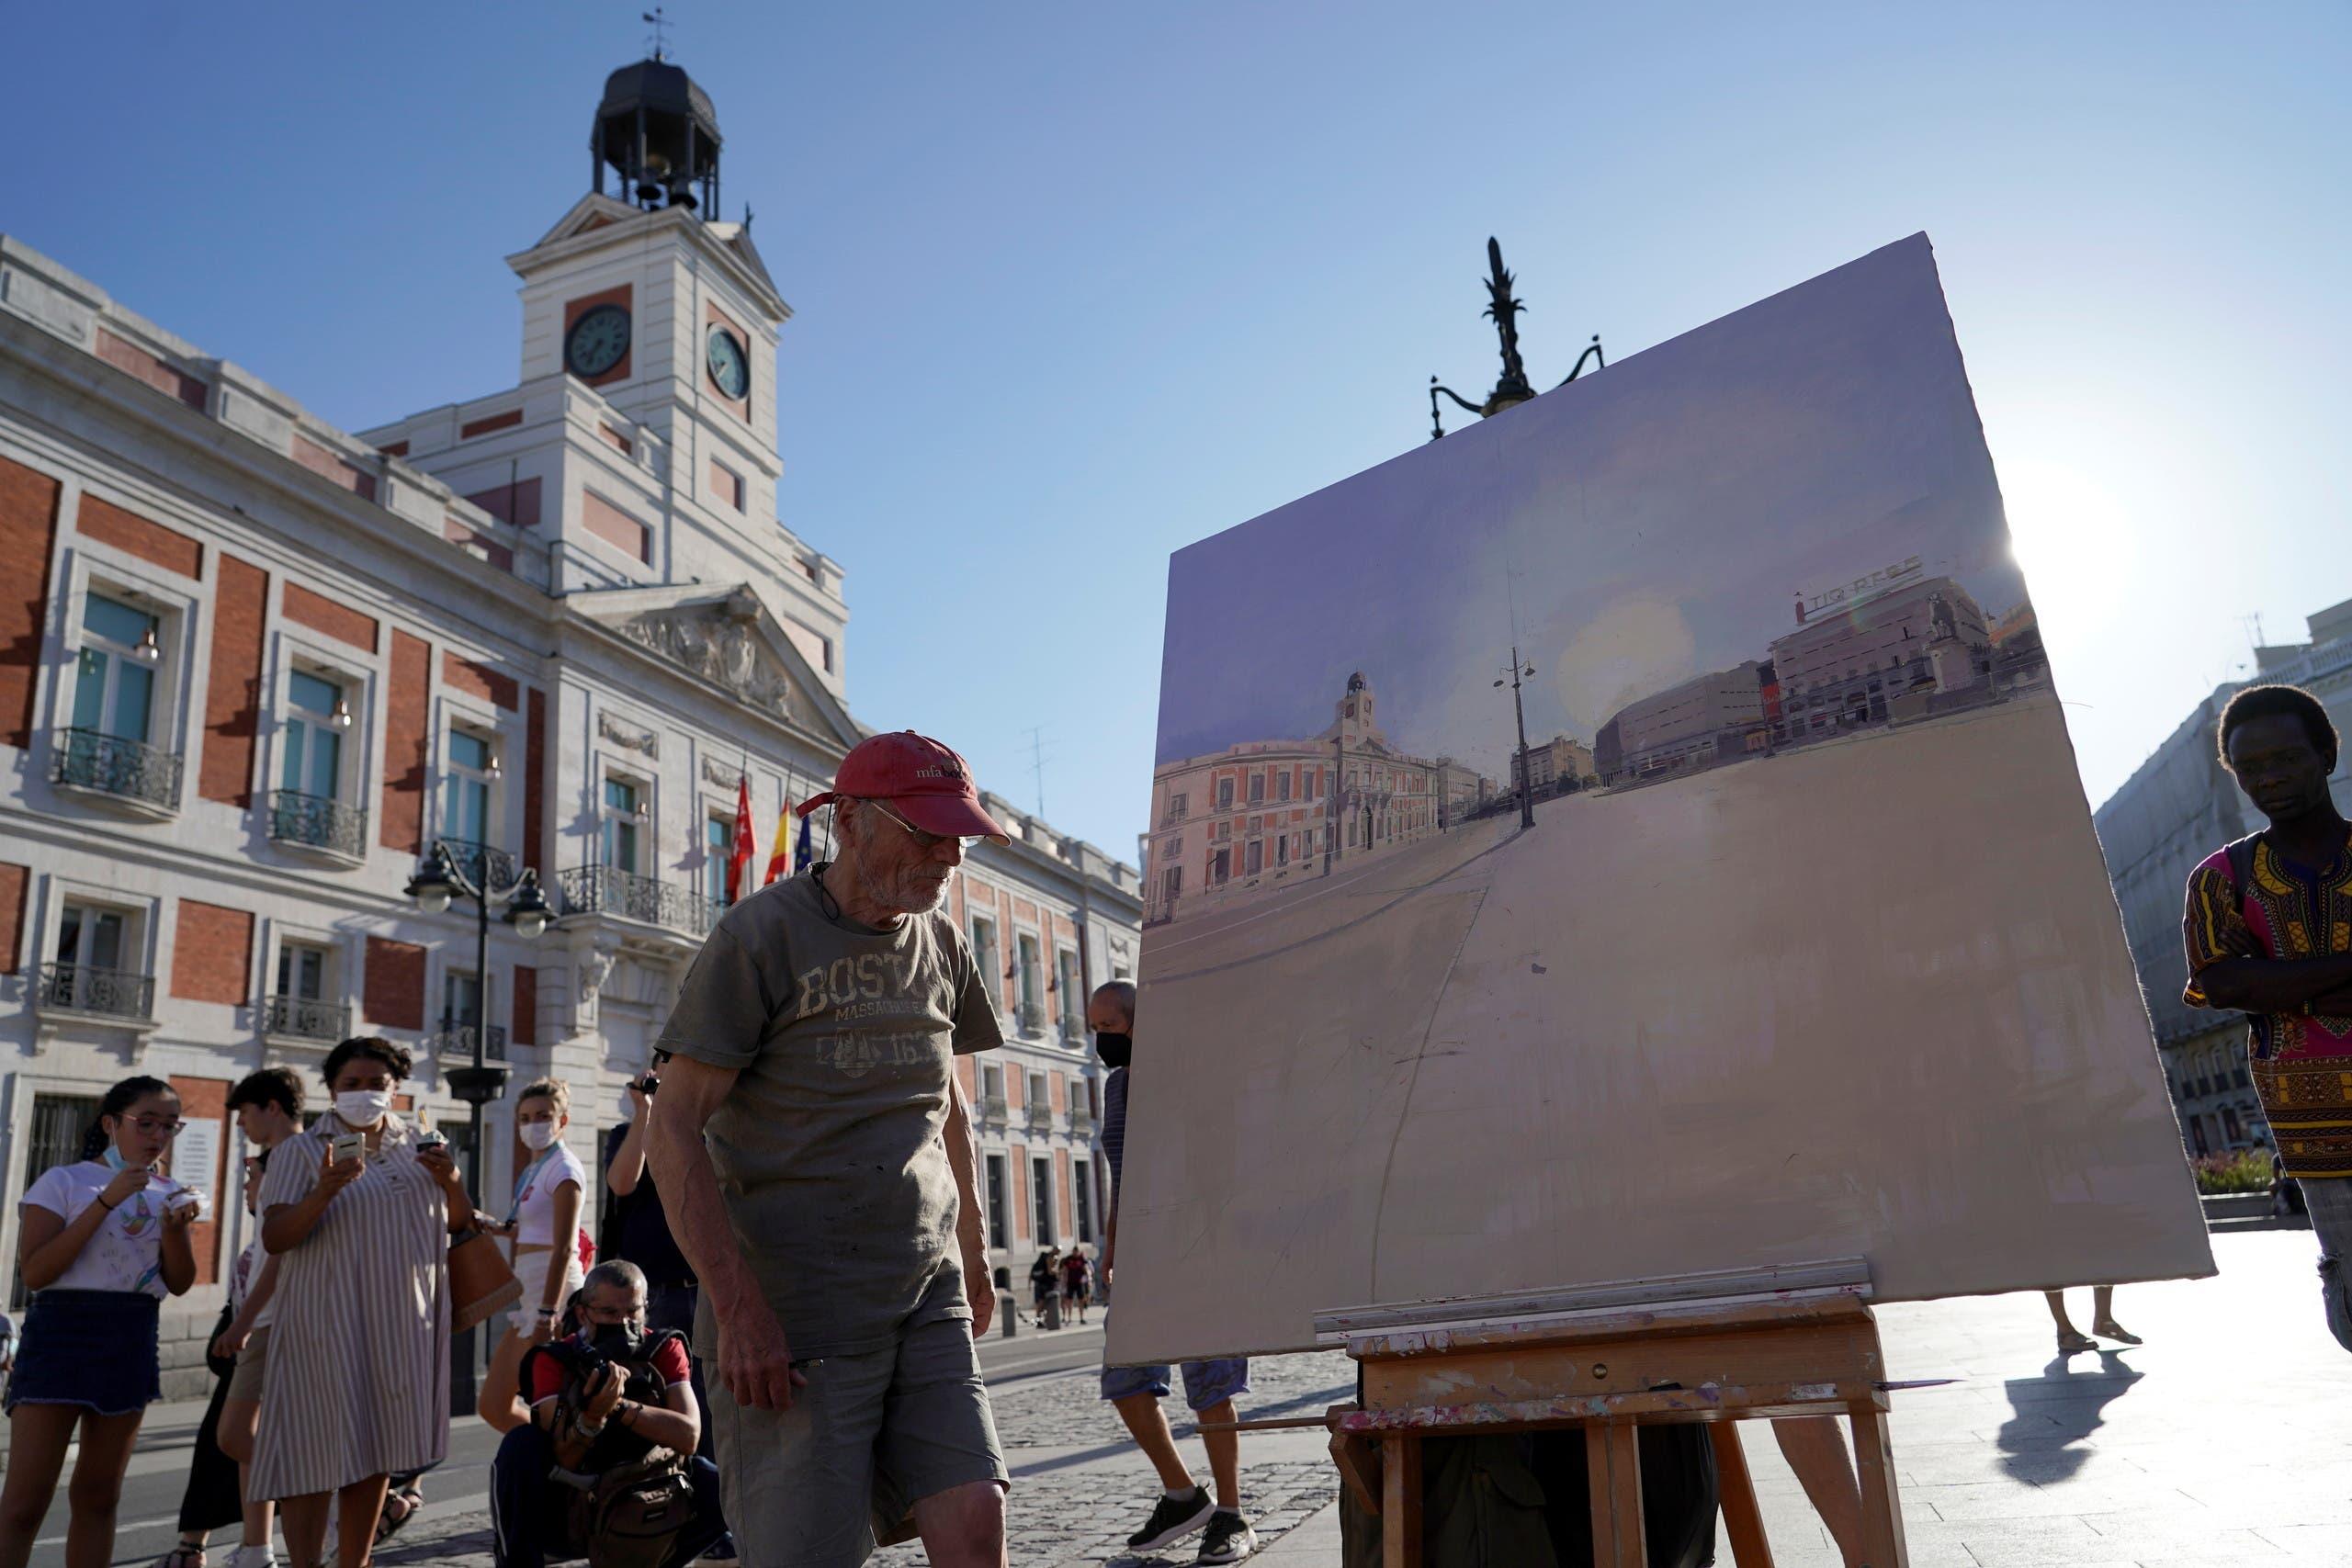 Spanish artist Antonio Lopez prepares to paint the famous Puerta del Sol square in Madrid, Spain, August 5, 2021. Picture taken August 5, 2021. REUTERS/Juan Medina